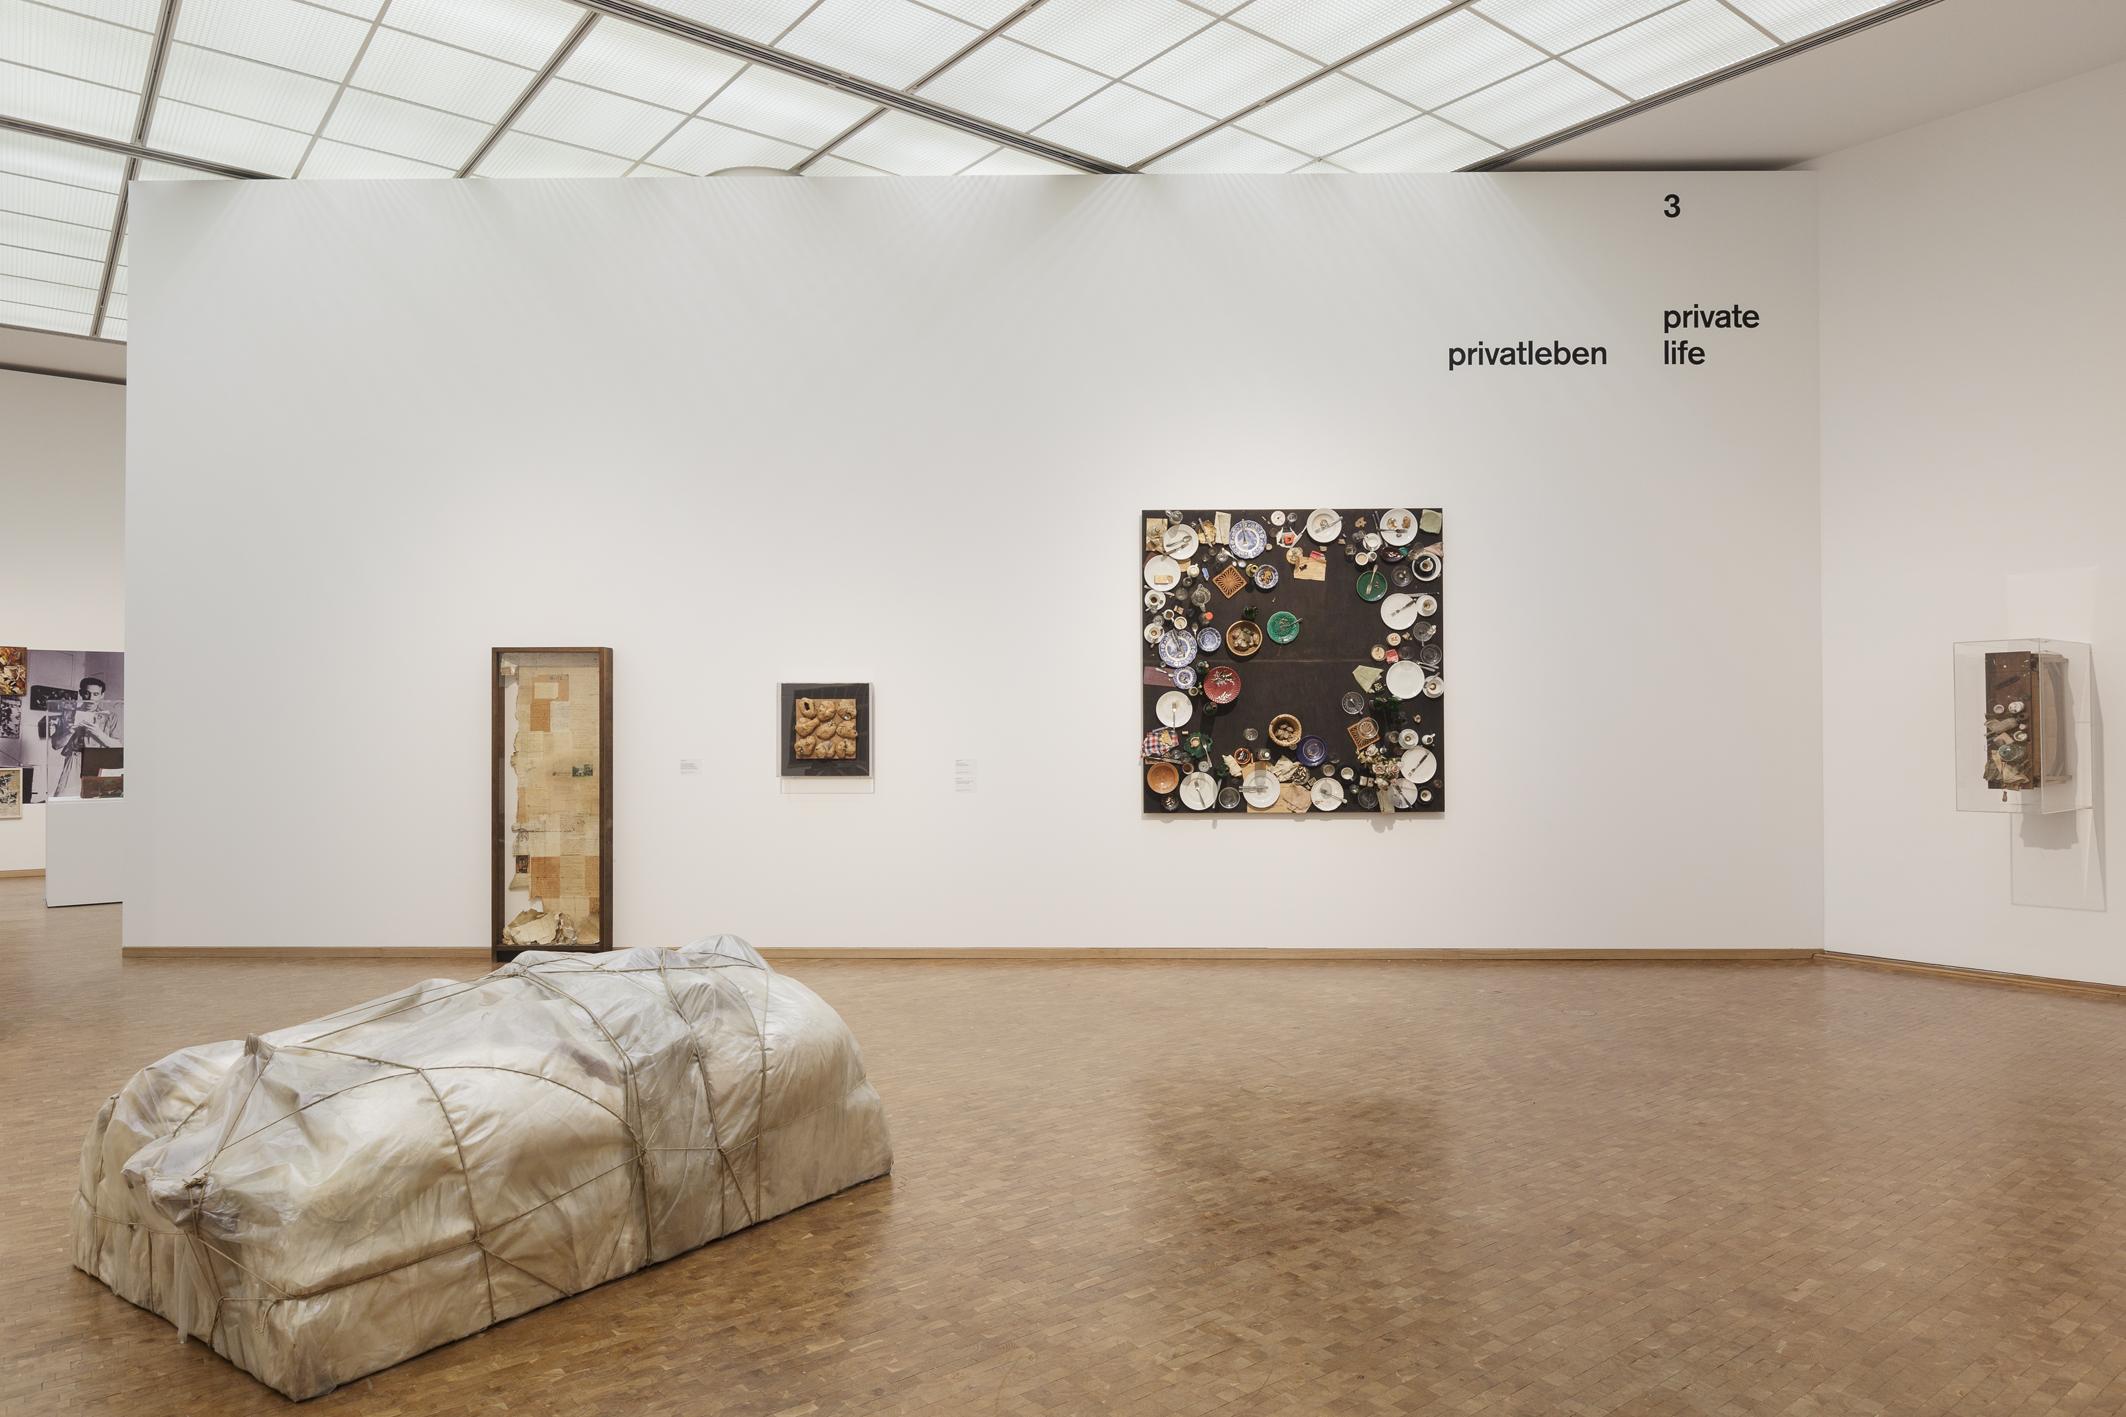 Wolfgang Hahn Kunst Ins Leben 07